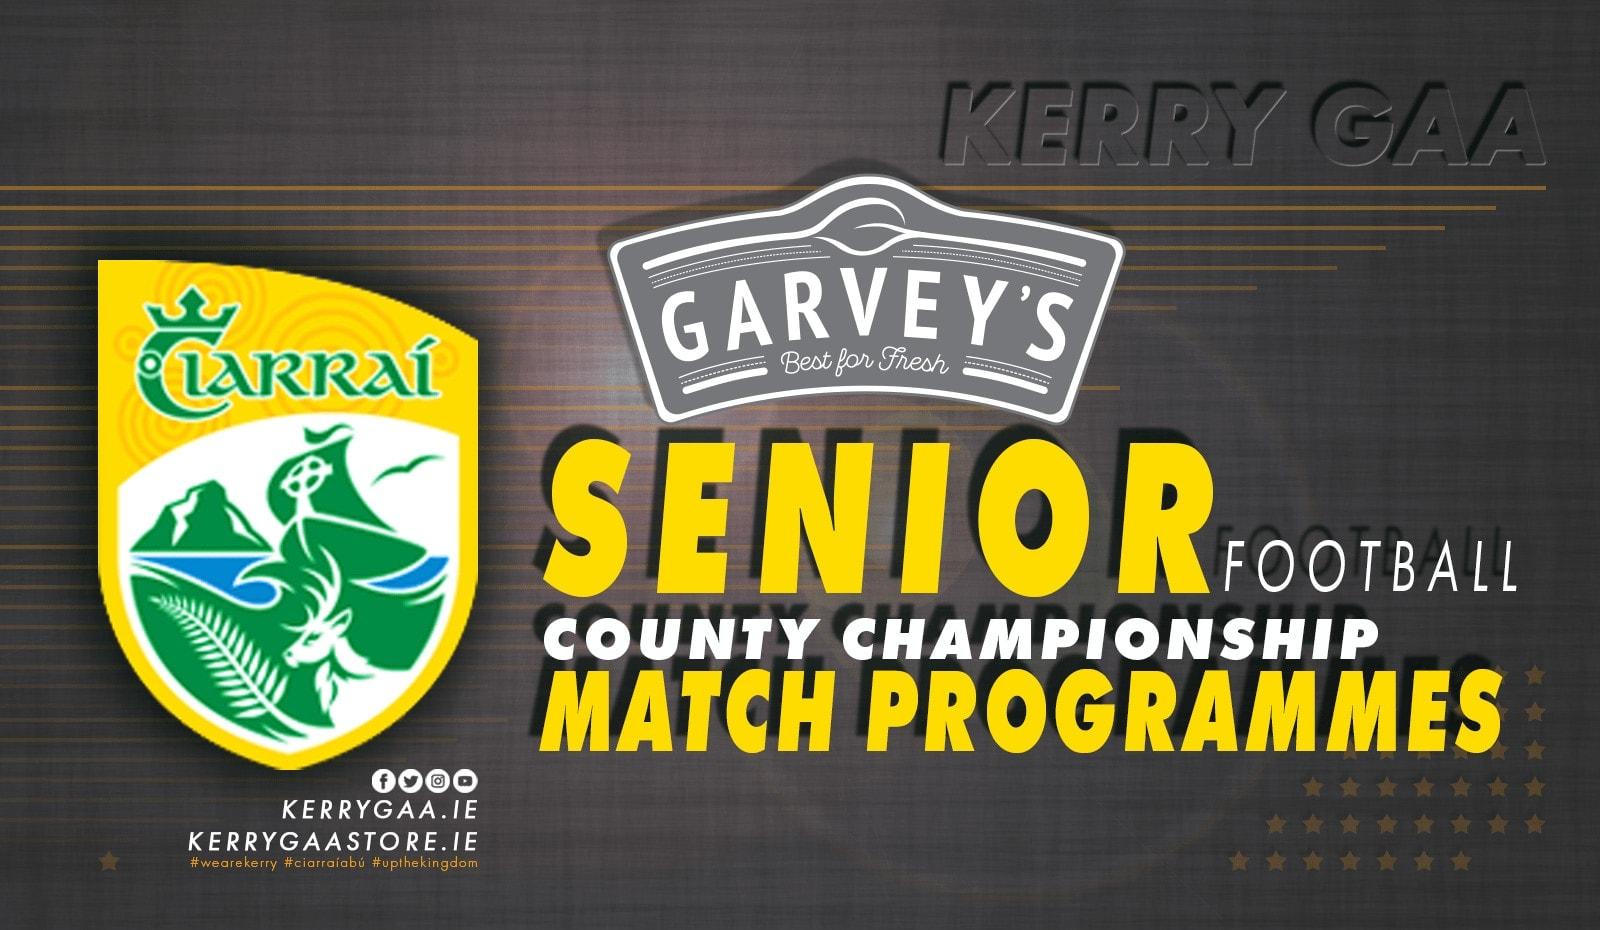 Garvey's Senior Football Championship